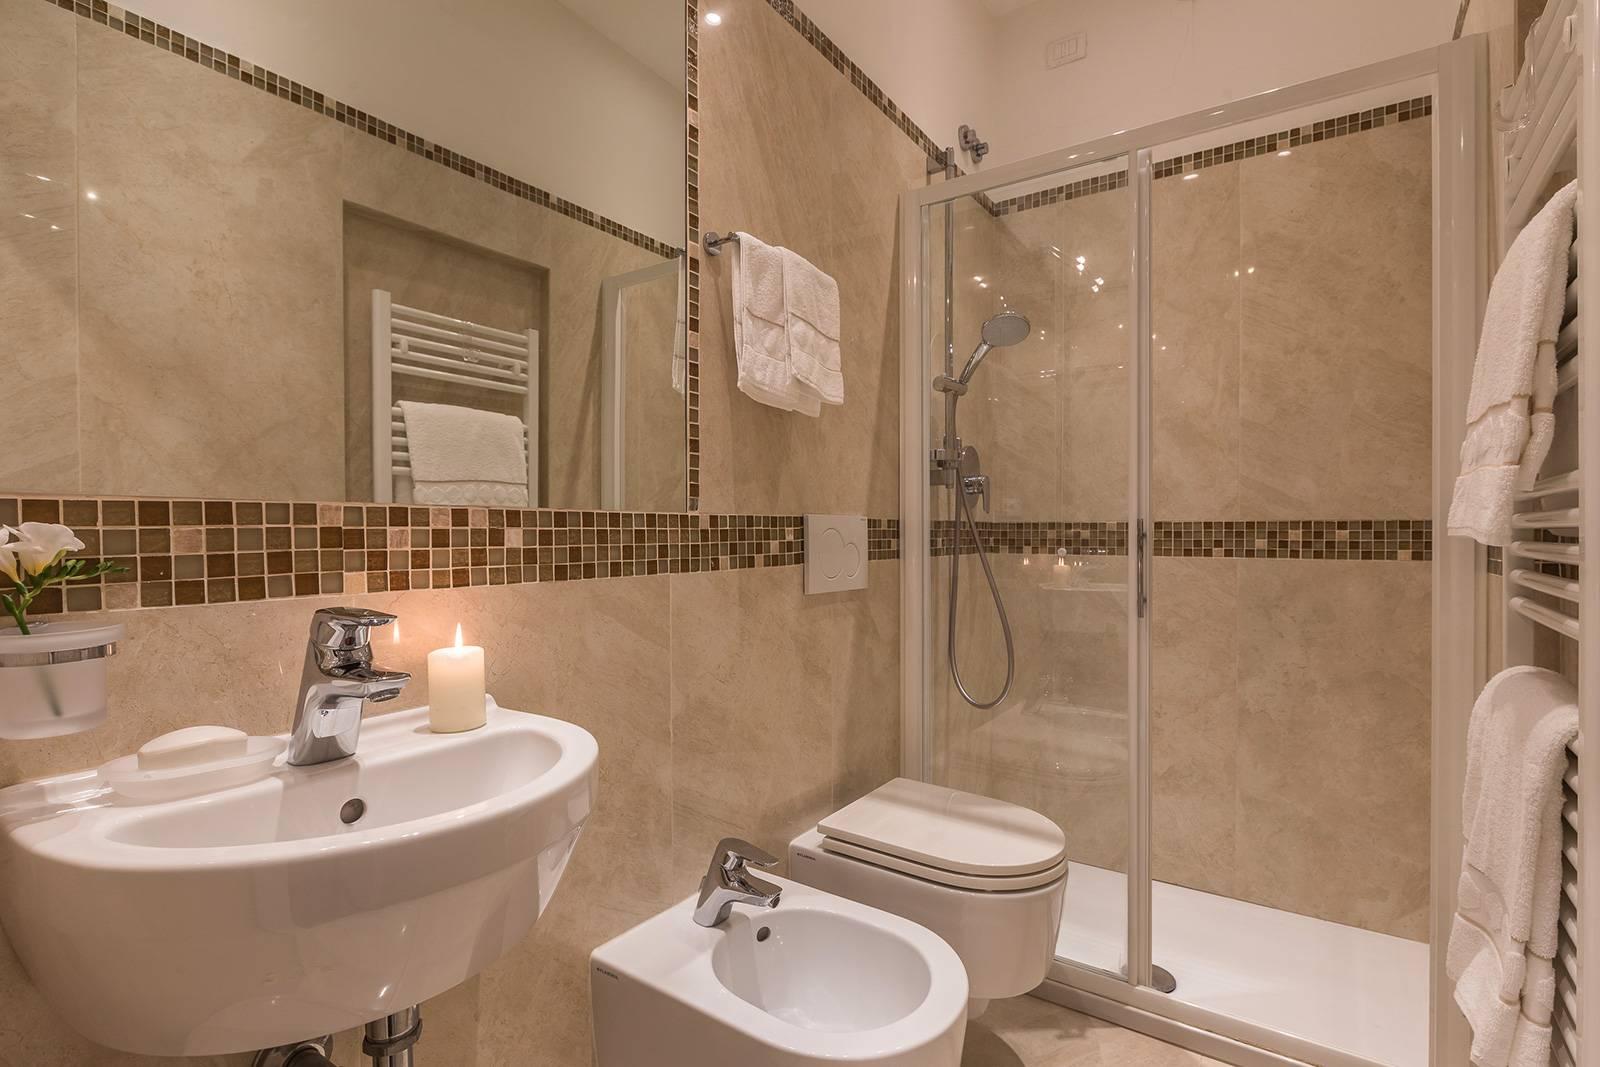 the smaller bathroom accessible from the corridor